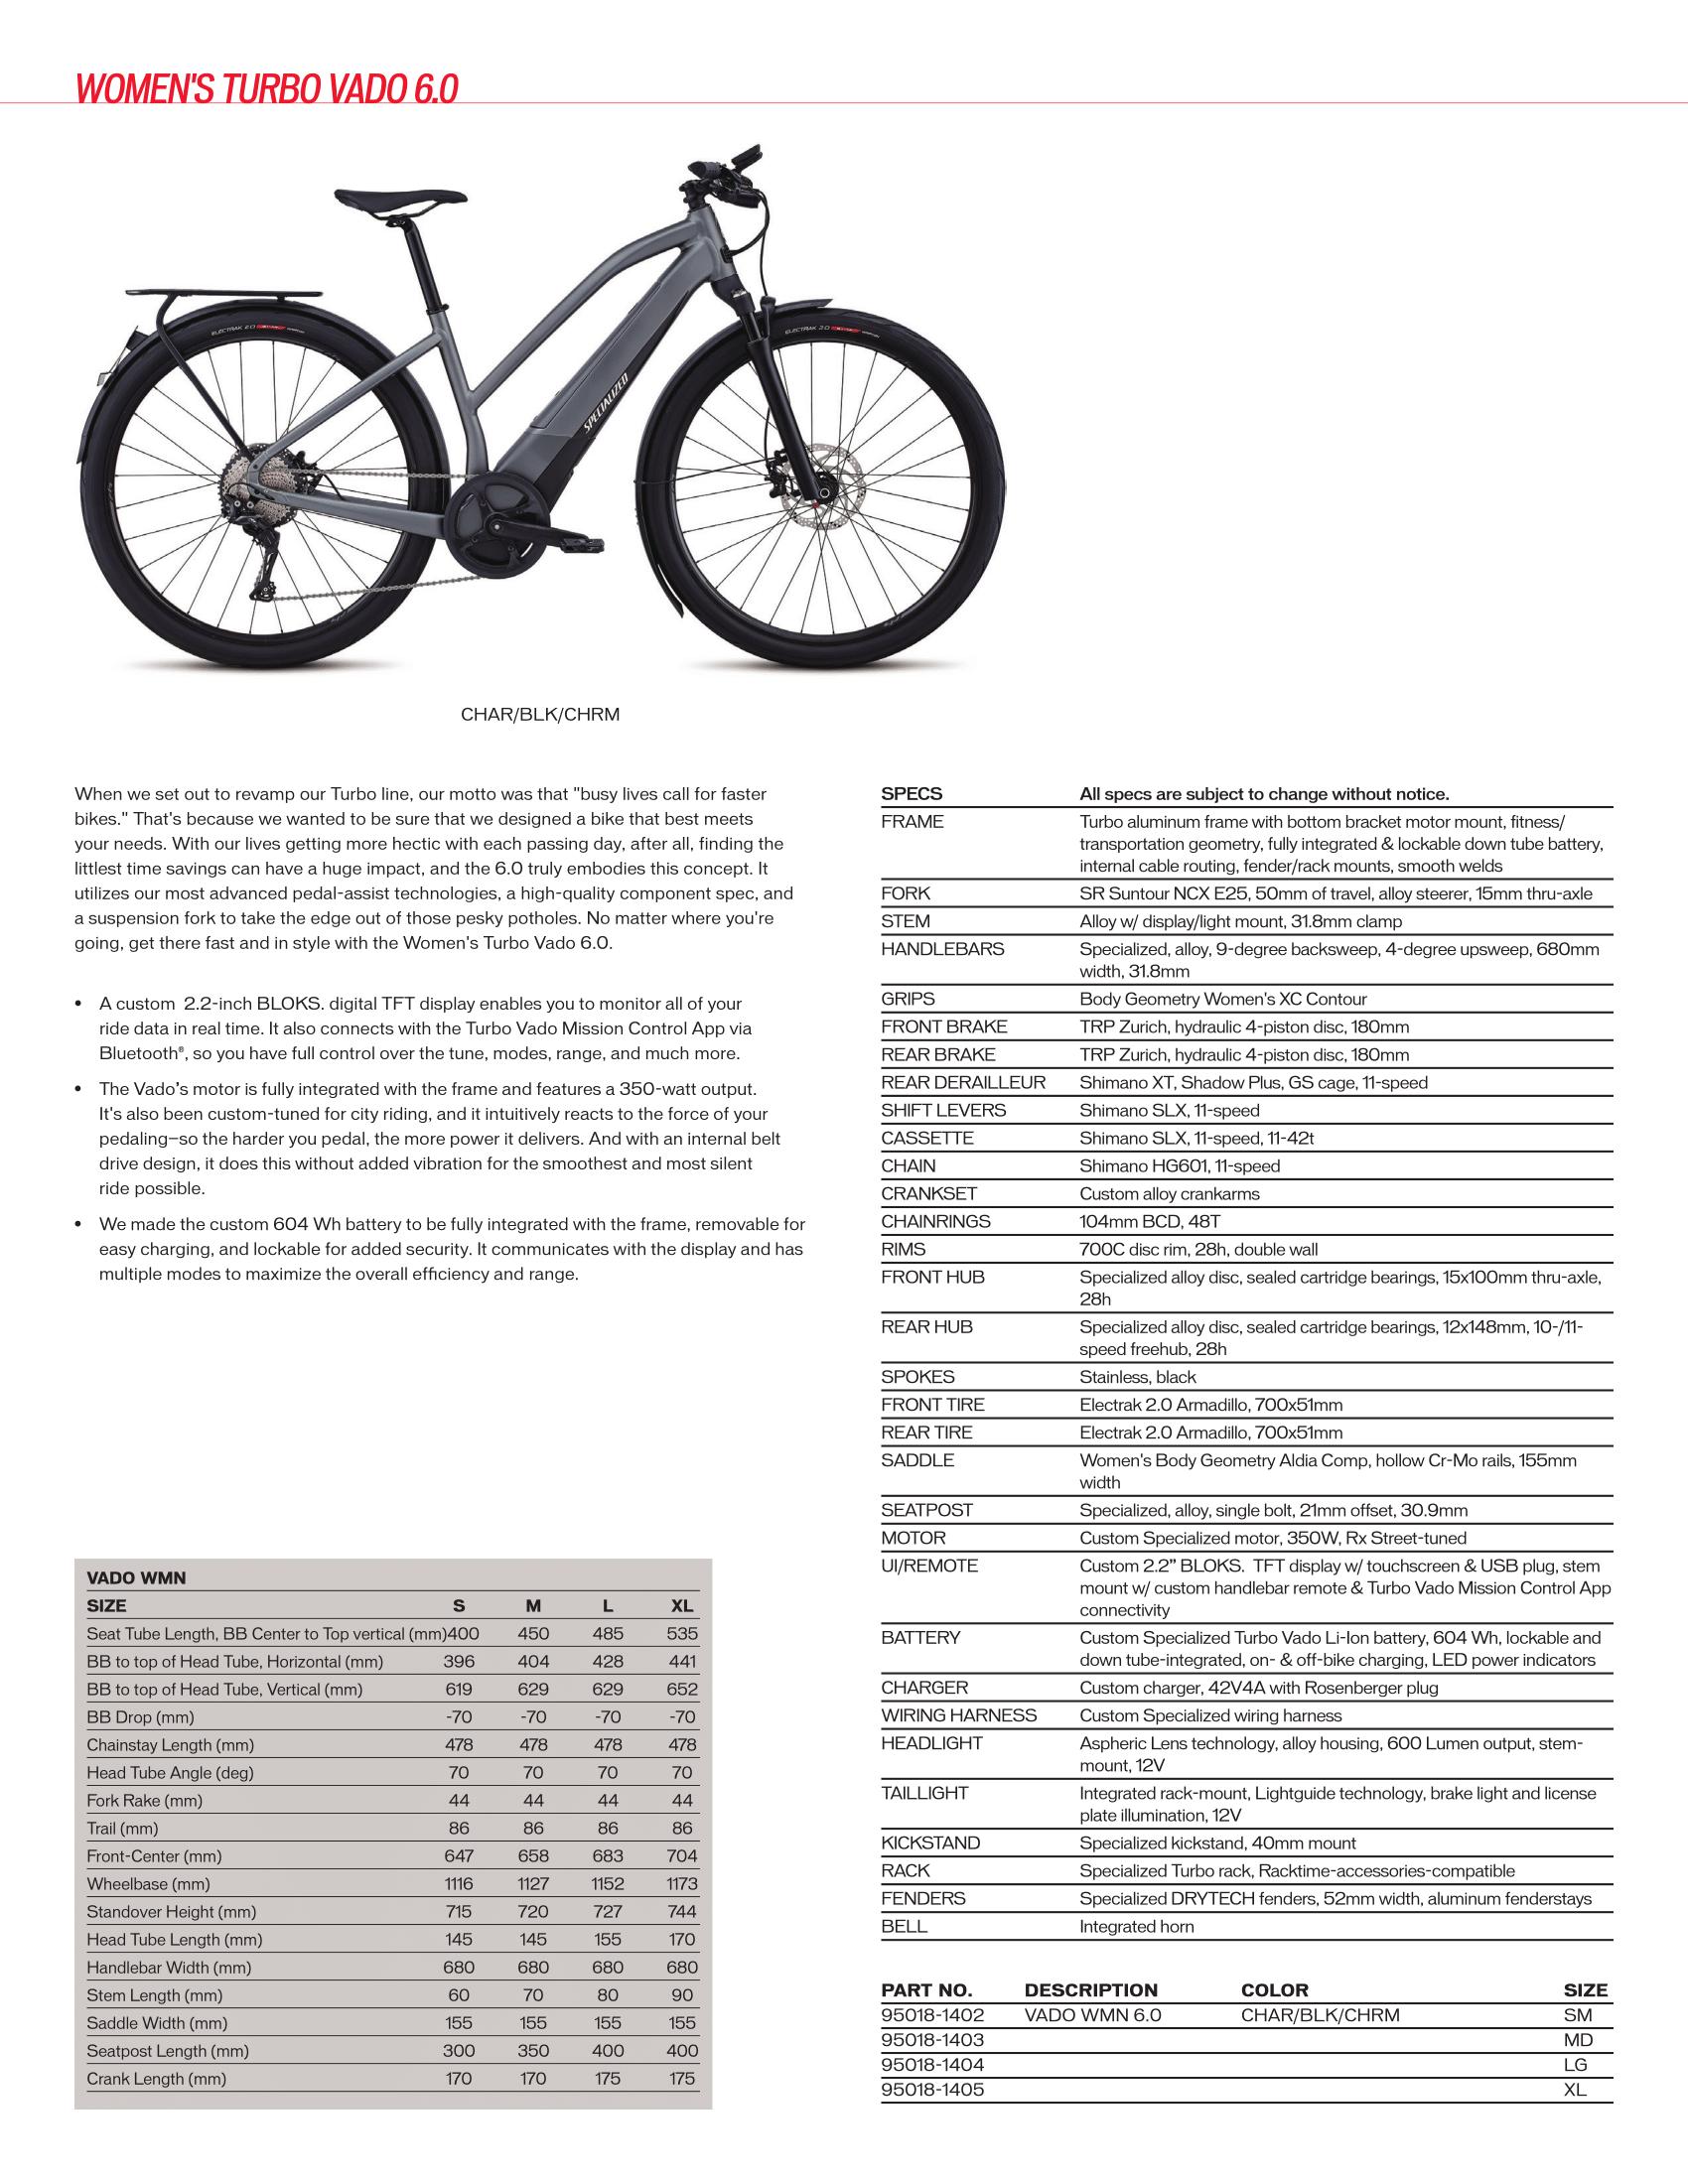 Women's Specialized Turbo Vado 6.0 (E-Bikes)